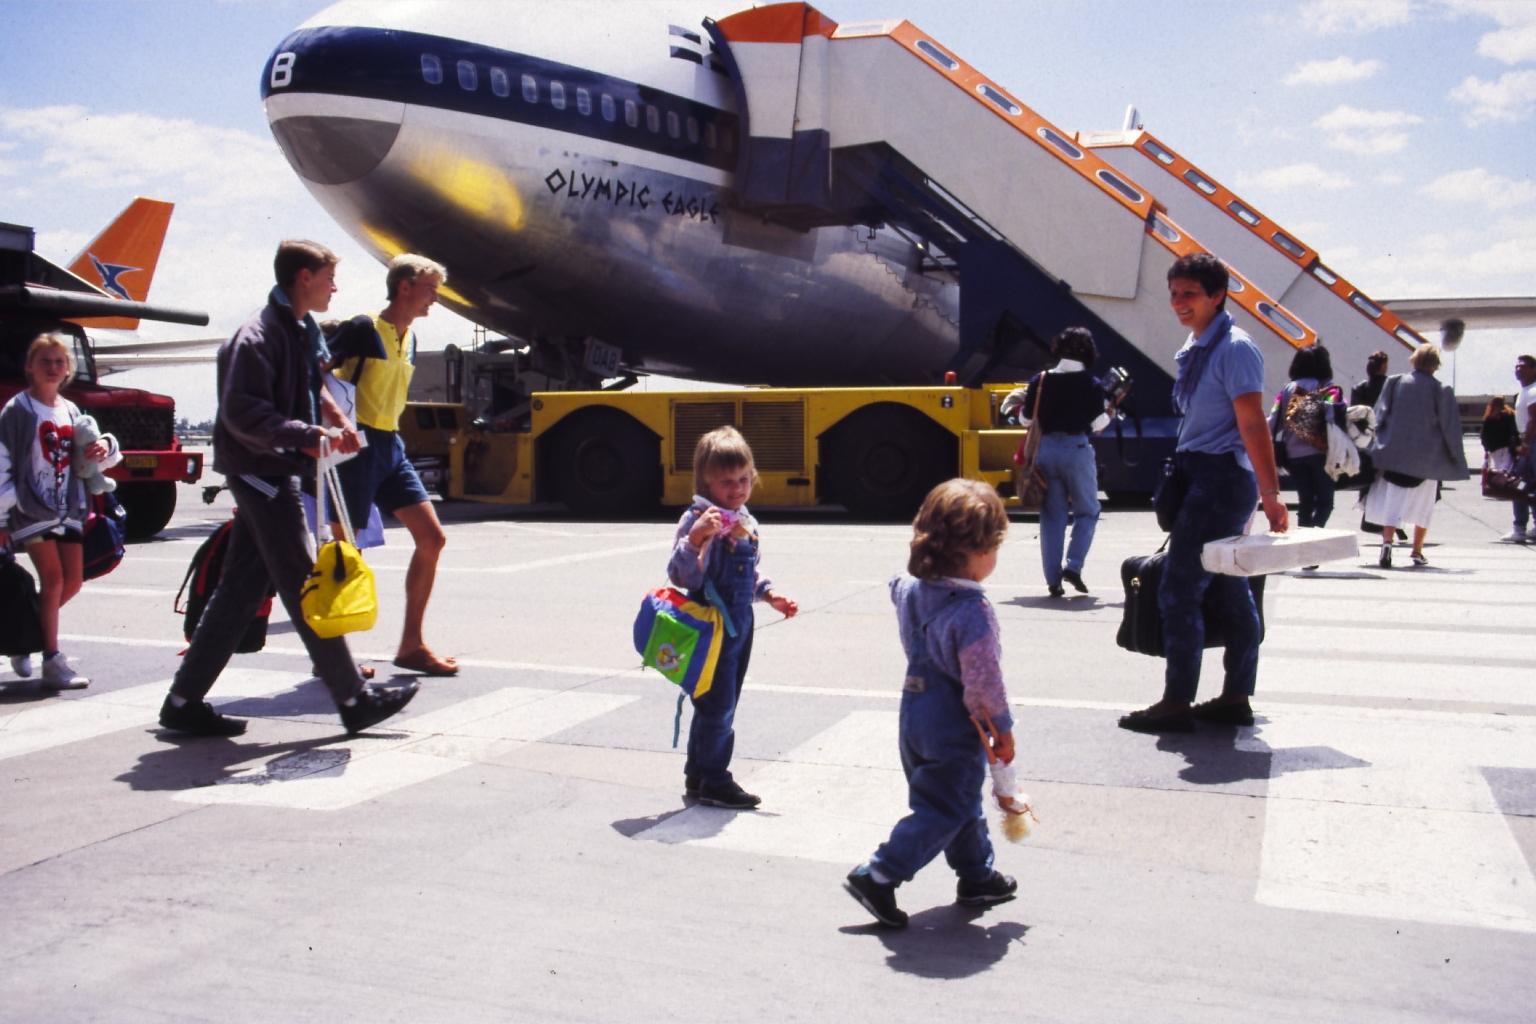 1989 - Another Intercontinental flight